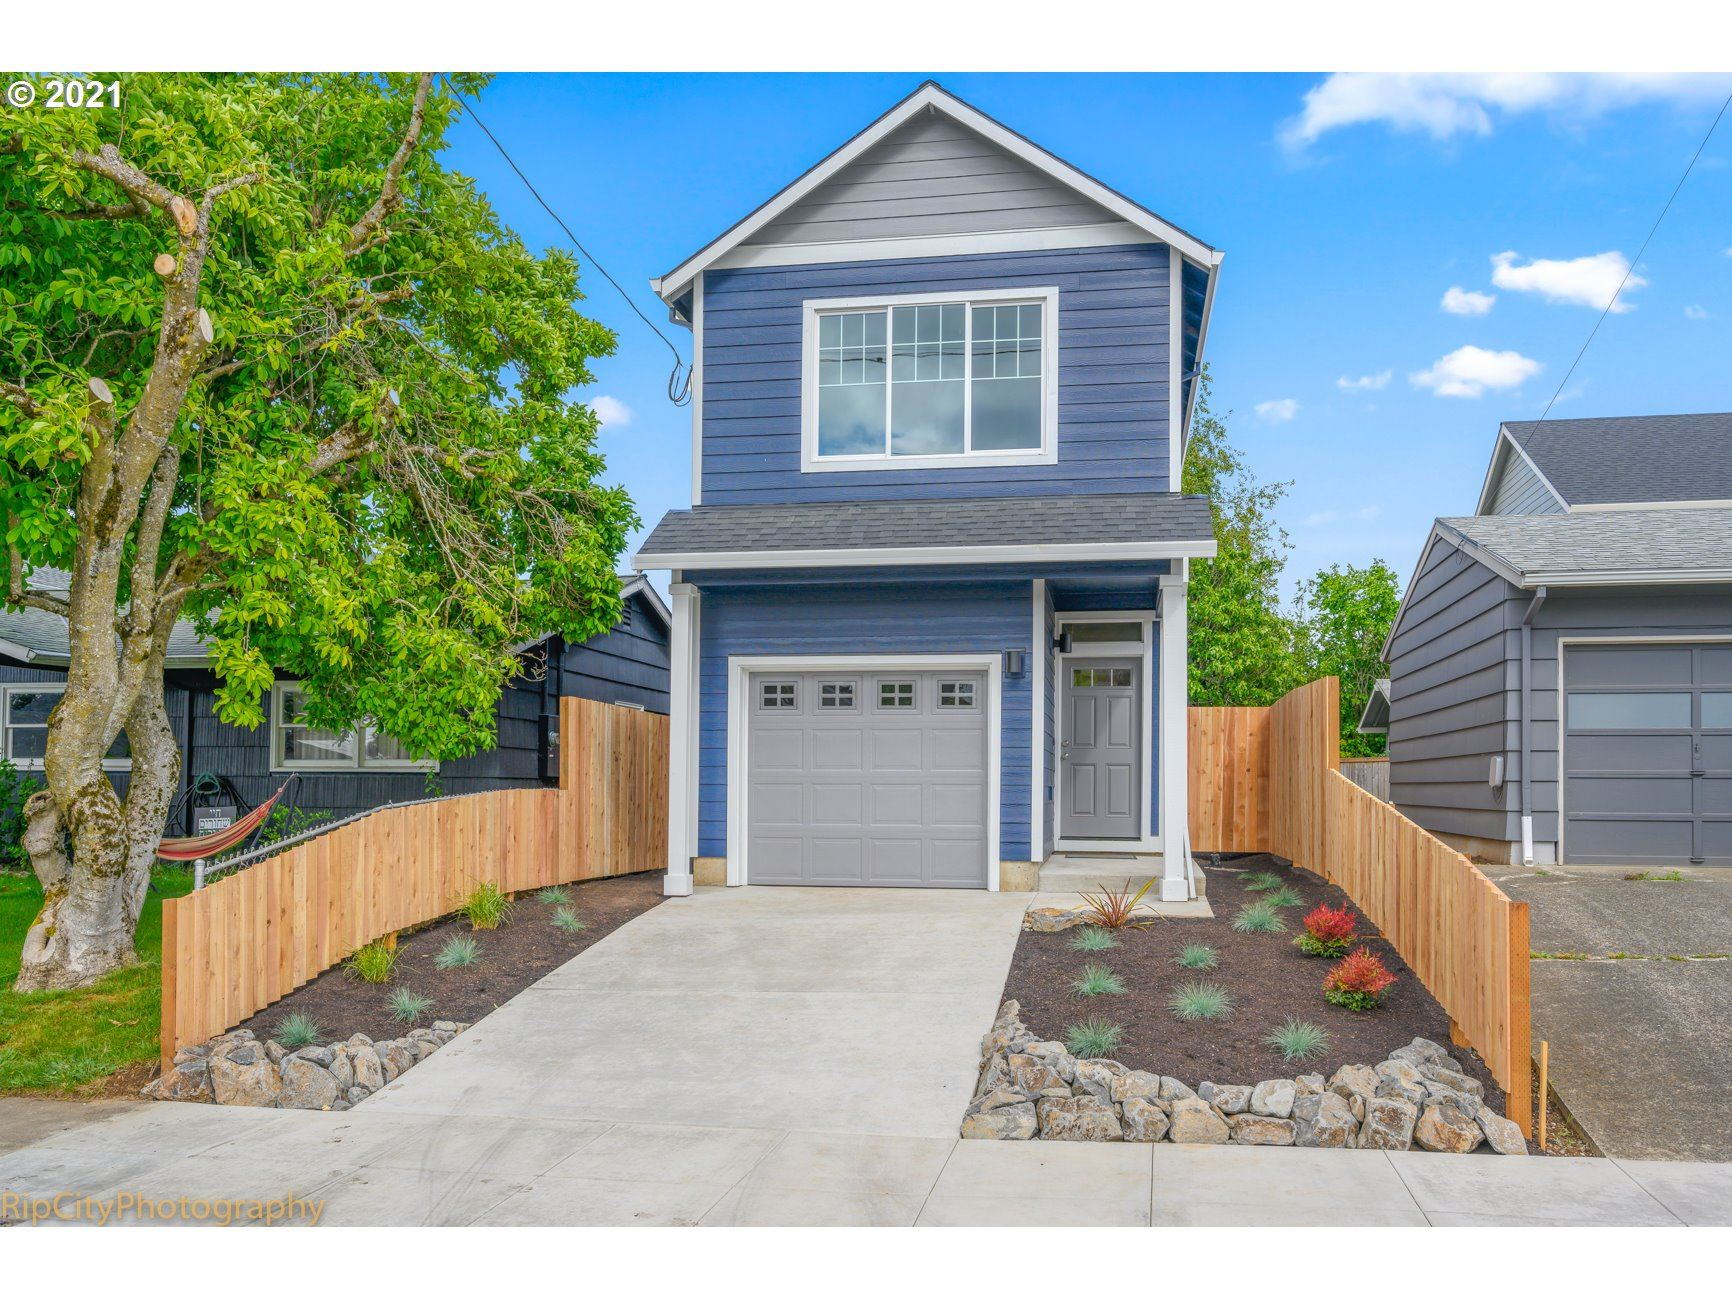 9018 N Allegheny AVE, Portland, OR 97203 - MLS#: 21233993